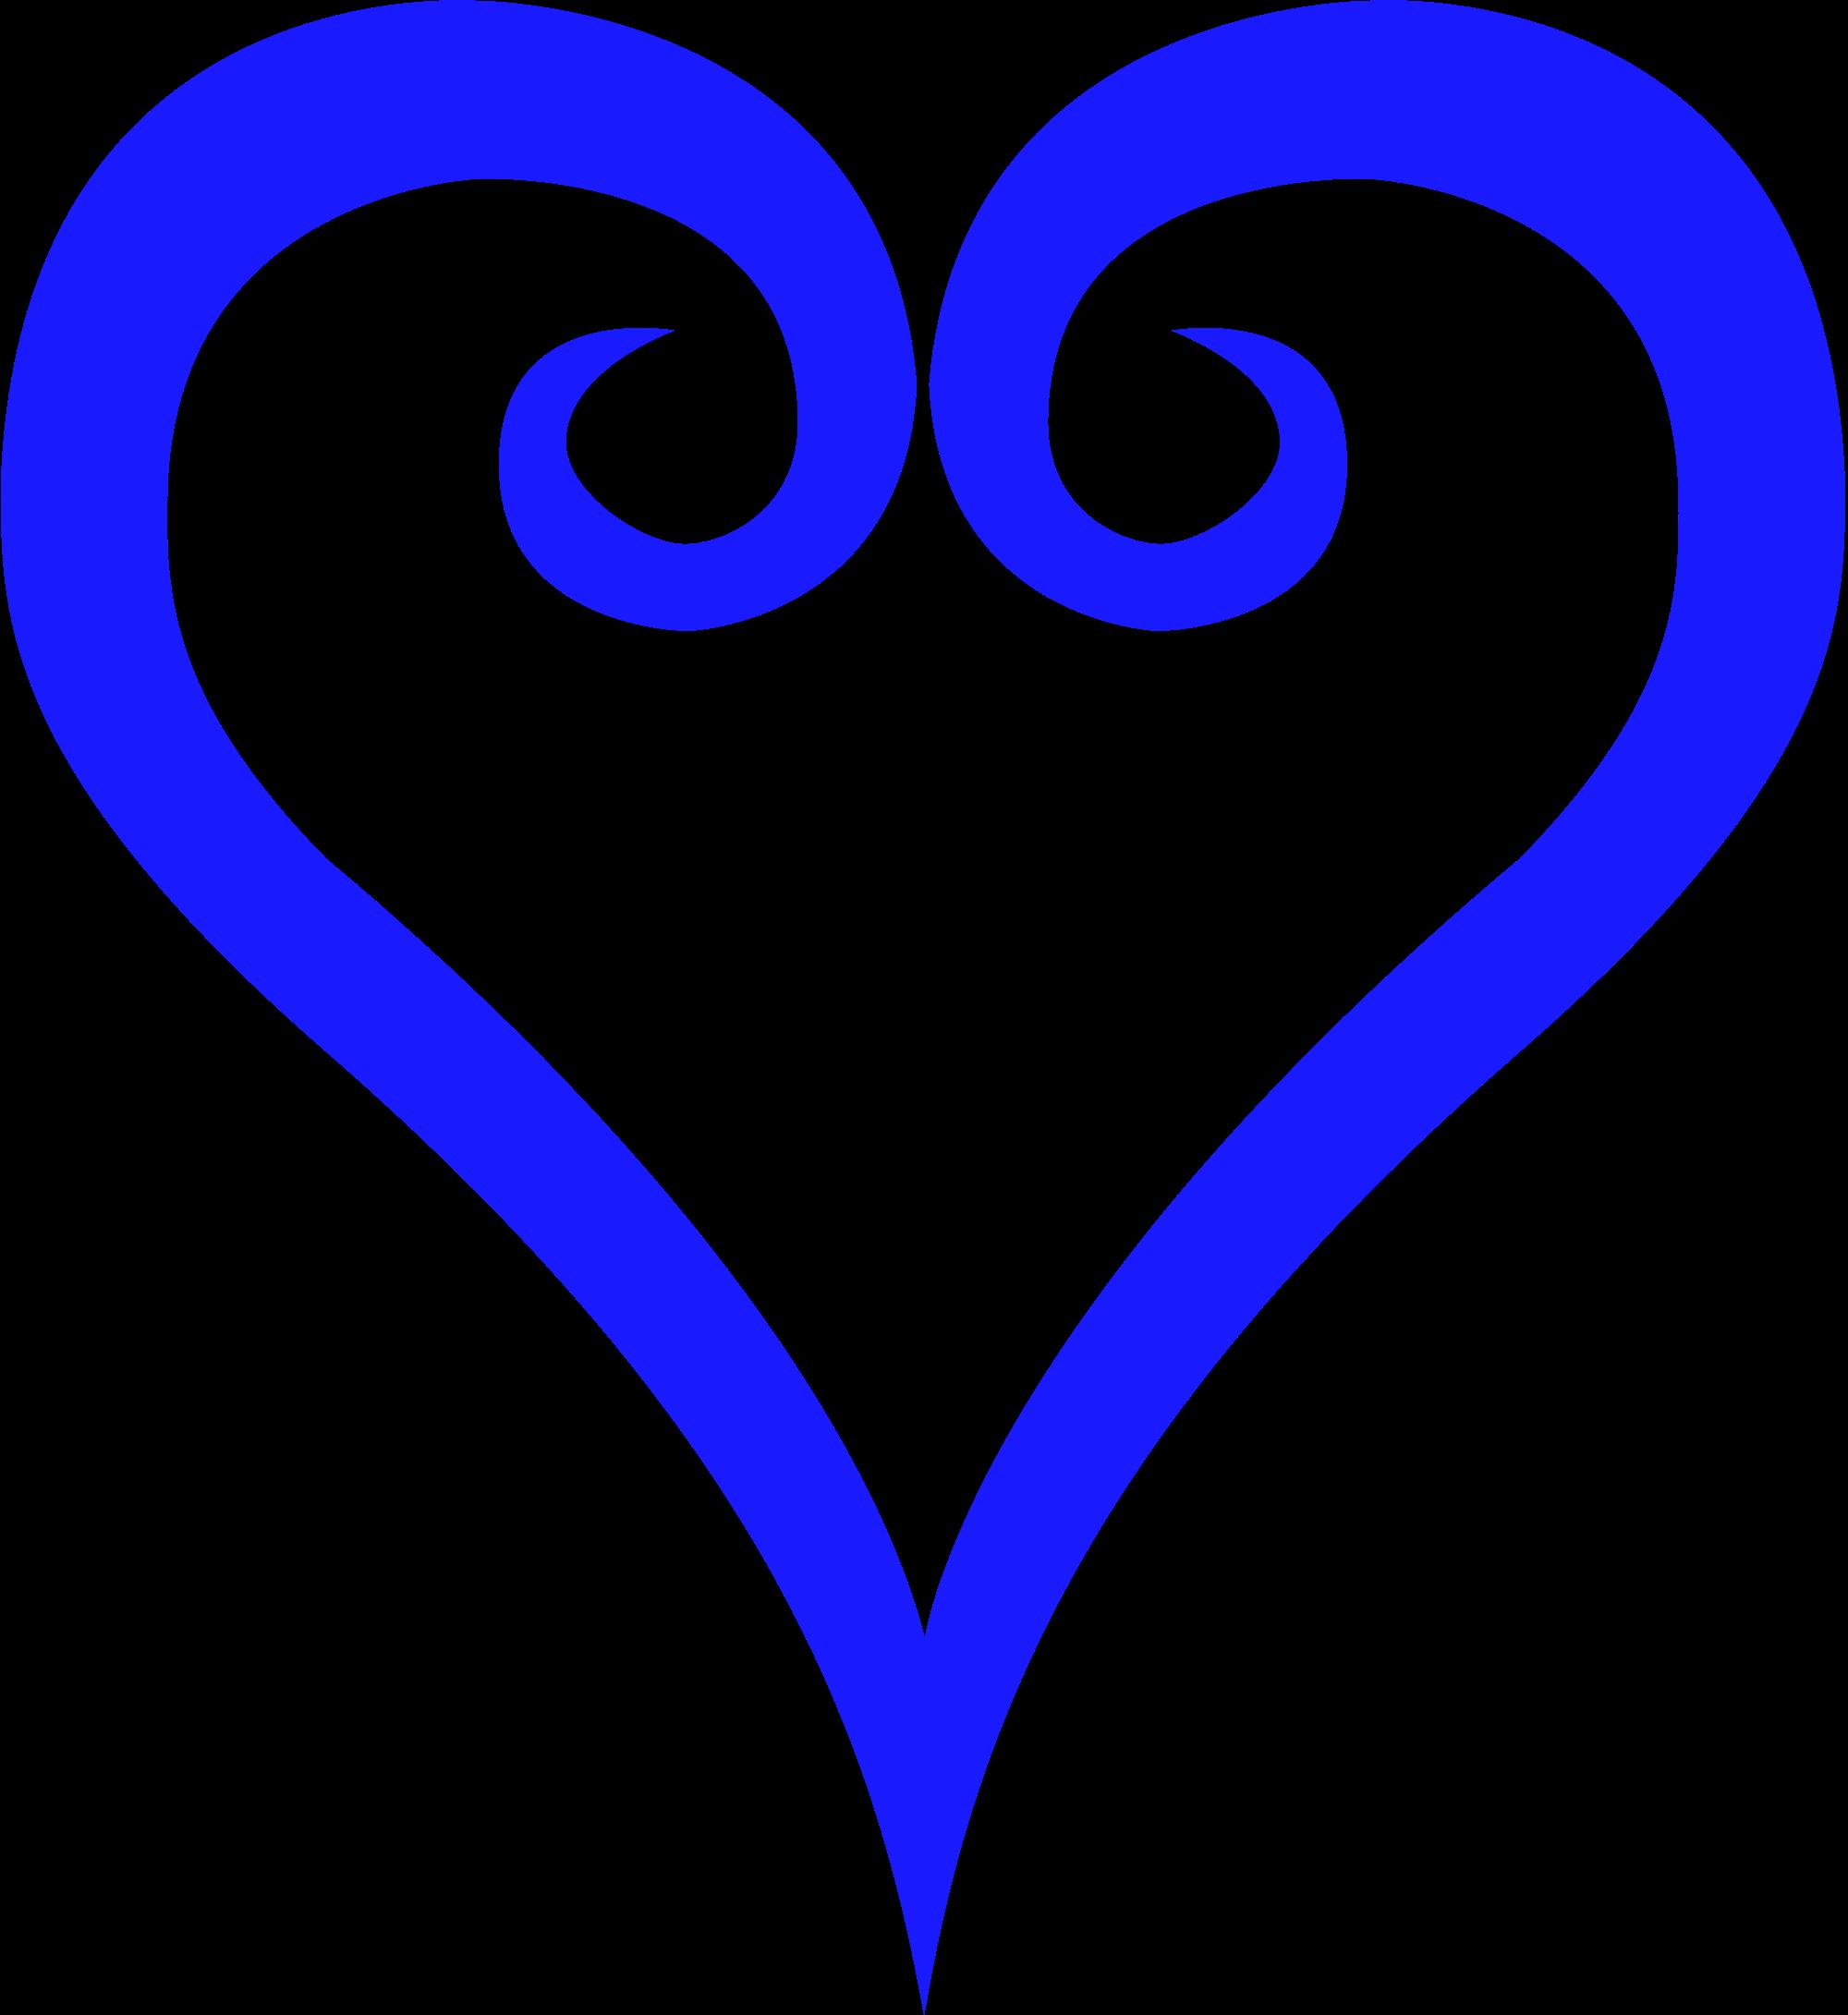 Kingdom hearts heart png. File symbol svg wikimedia